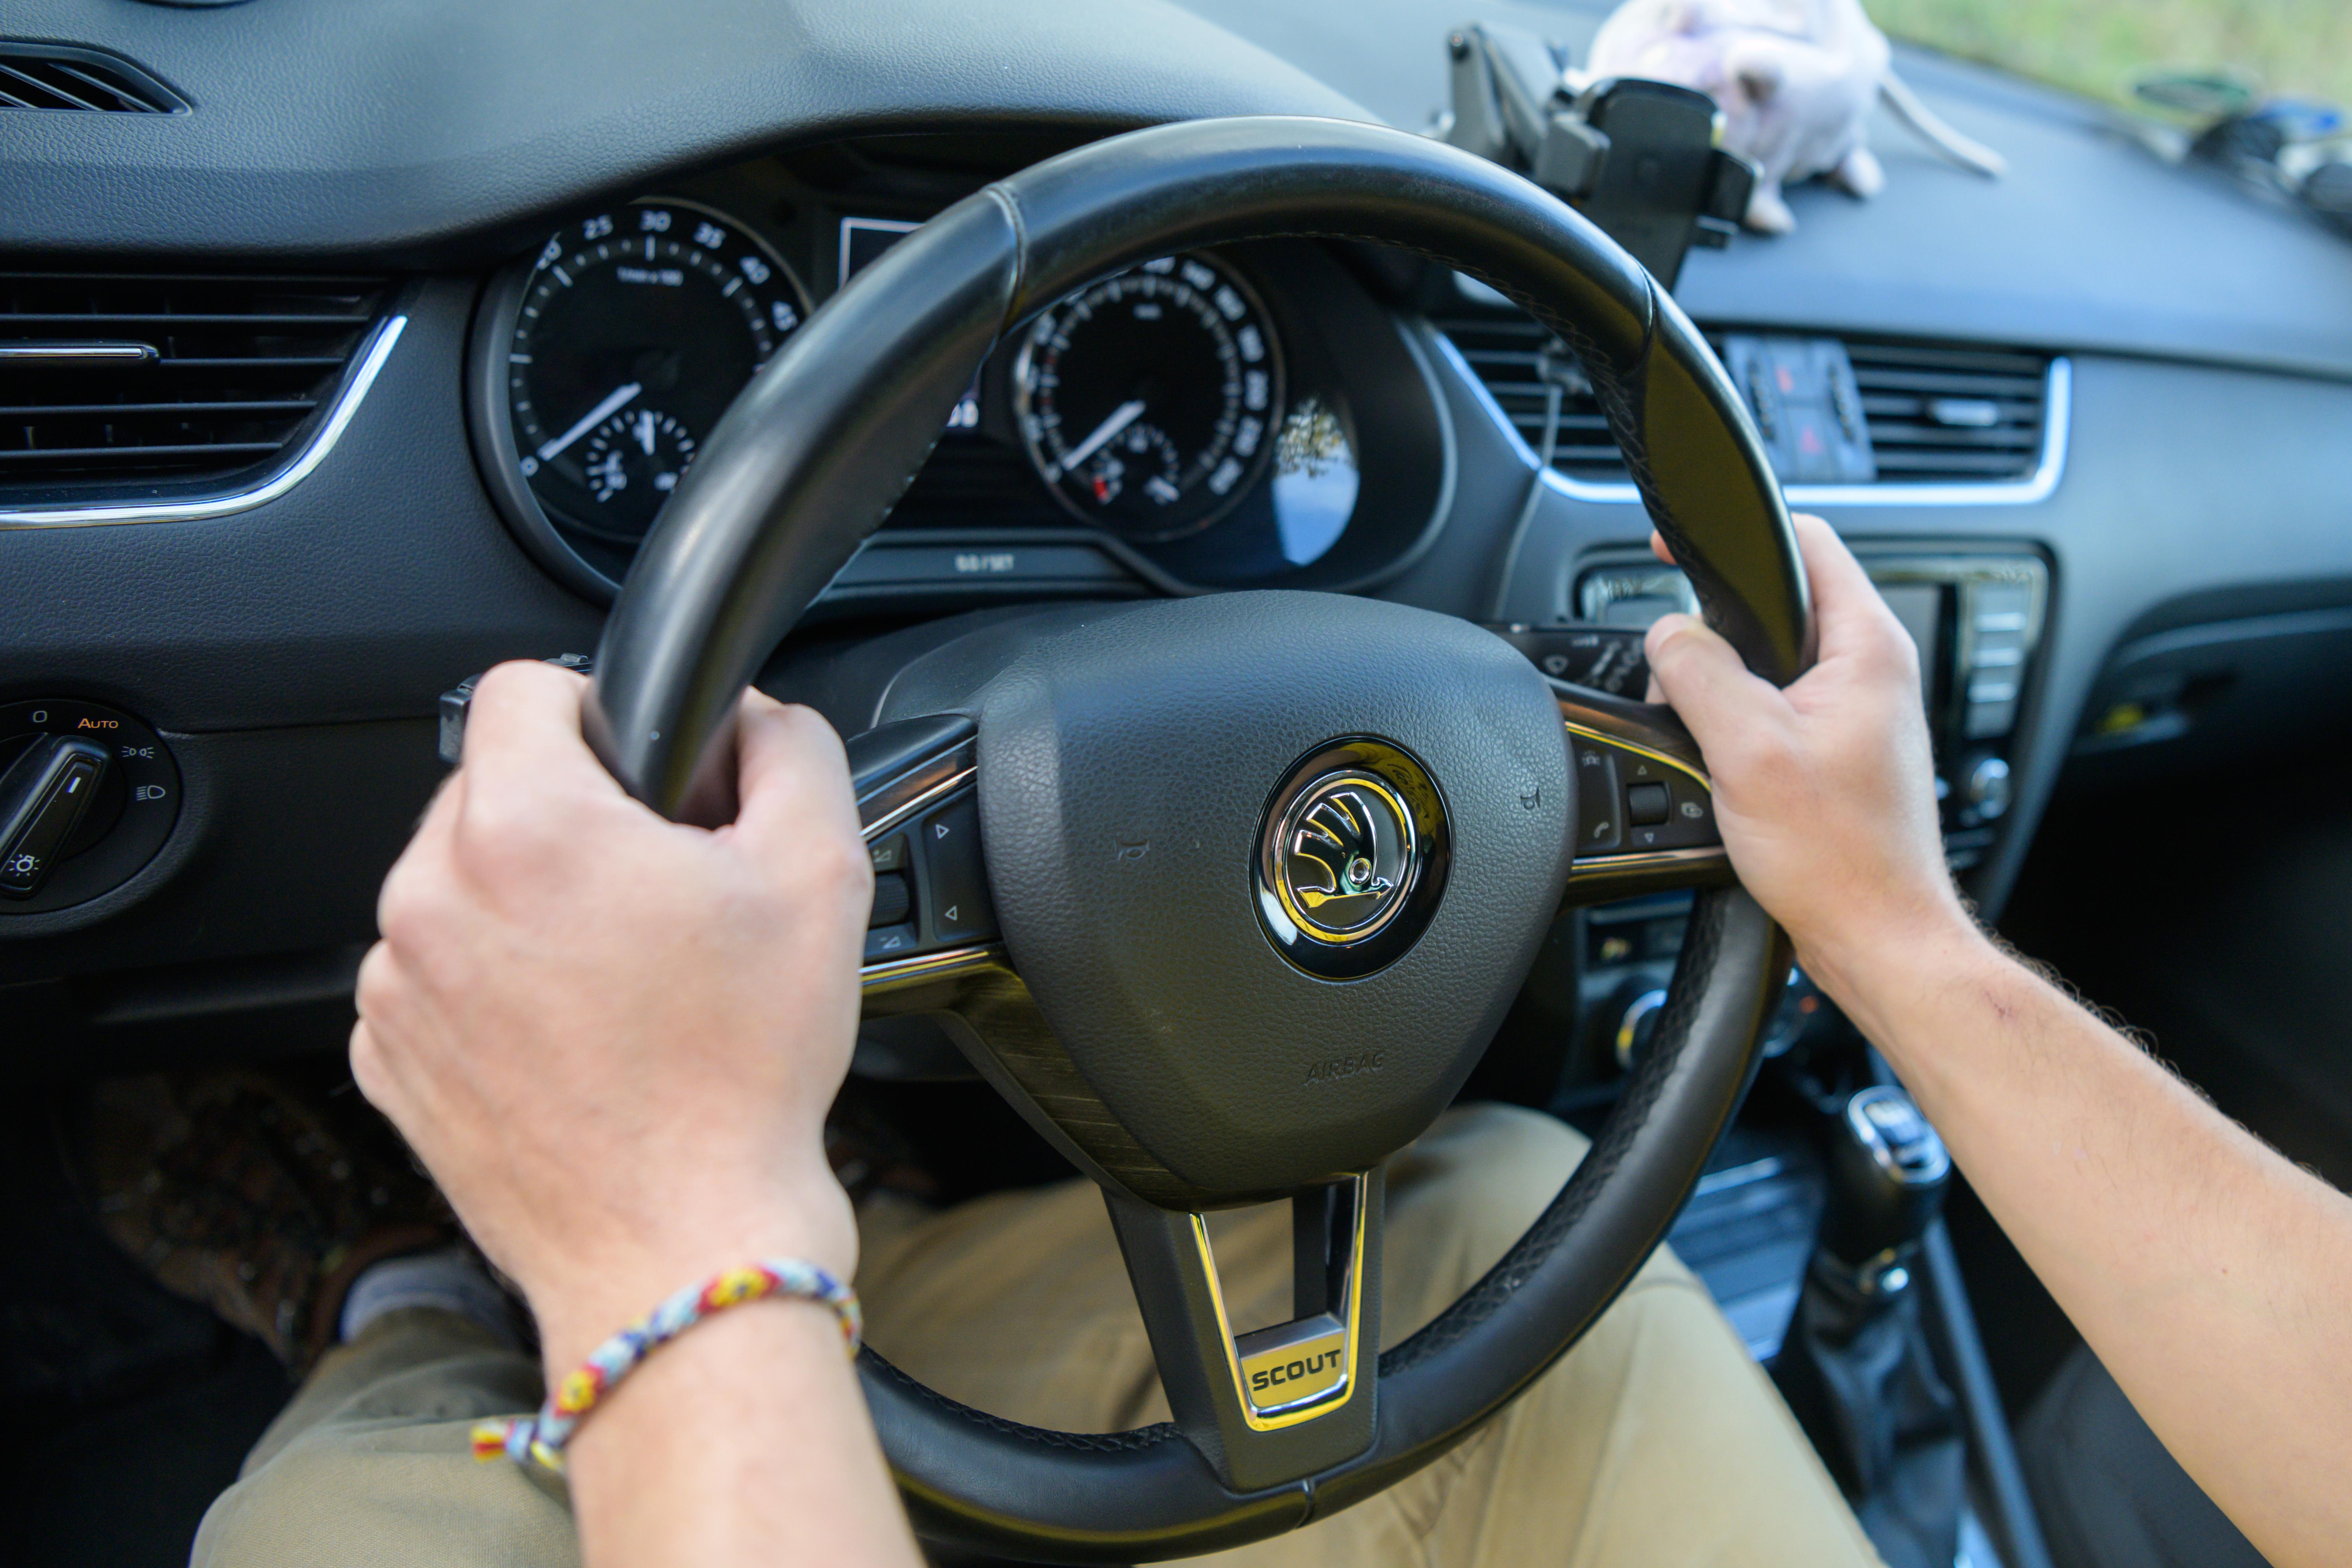 skoda-octavia-scout-steering-wheel